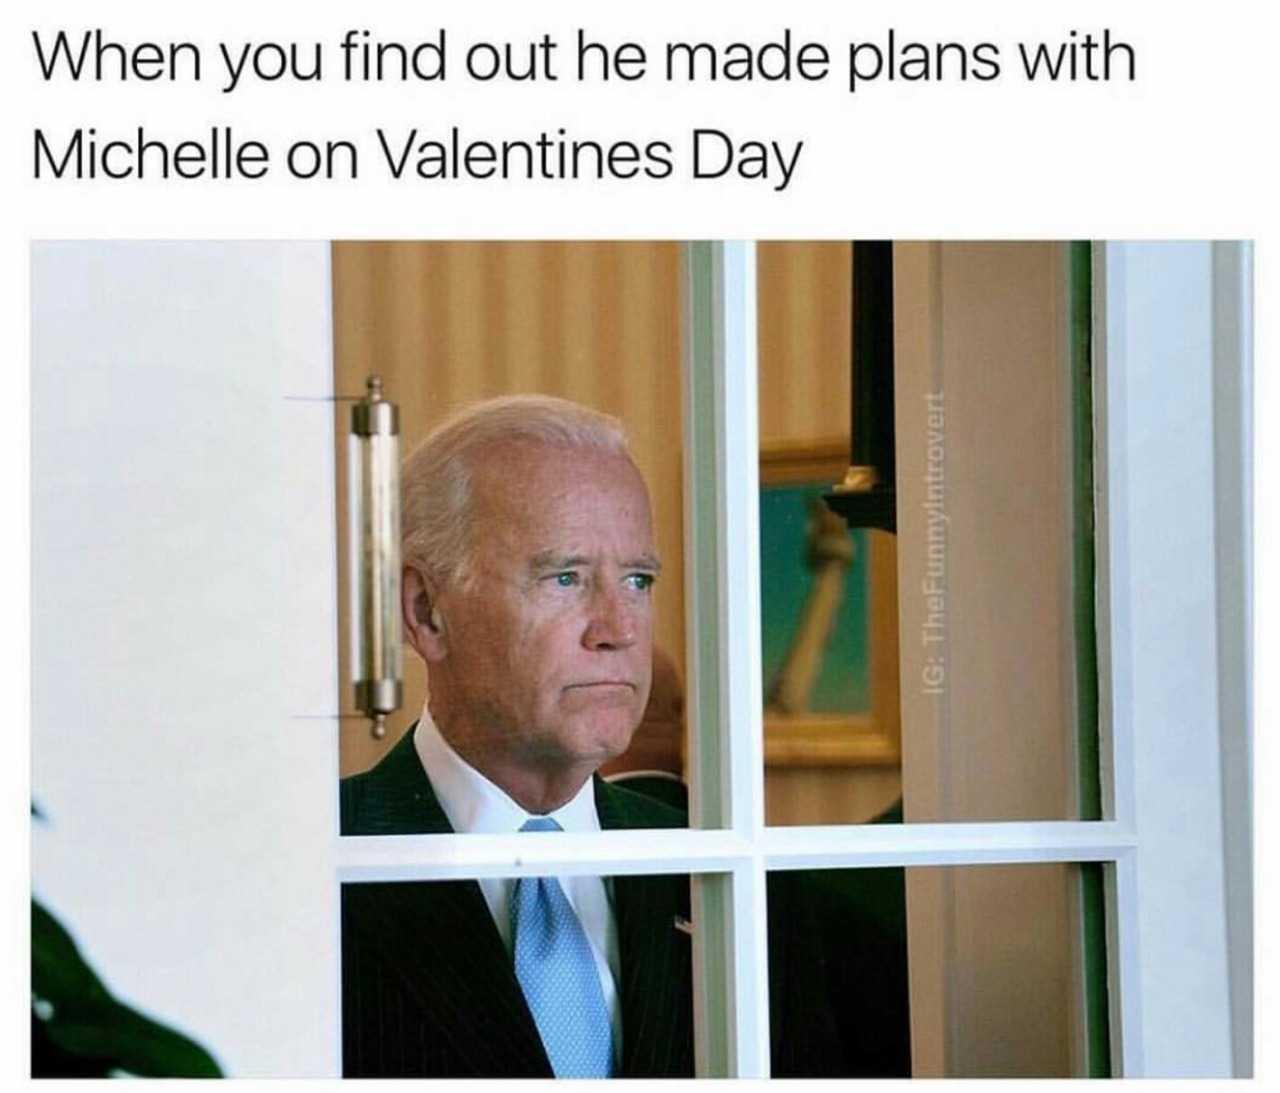 Obama and Biden Memes - alone on valentines day